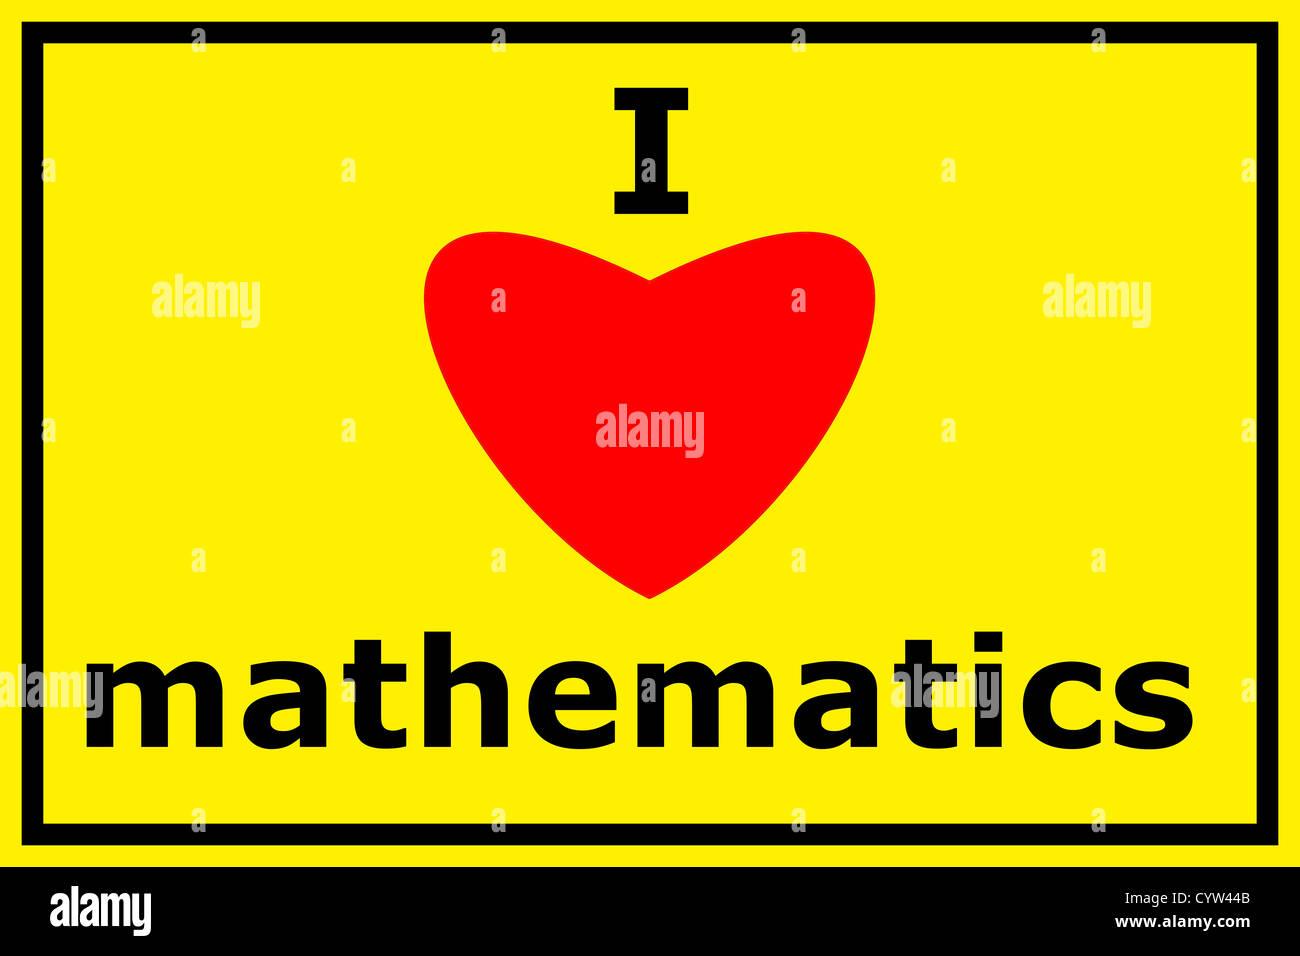 i love math stock photos & i love math stock images - alamy